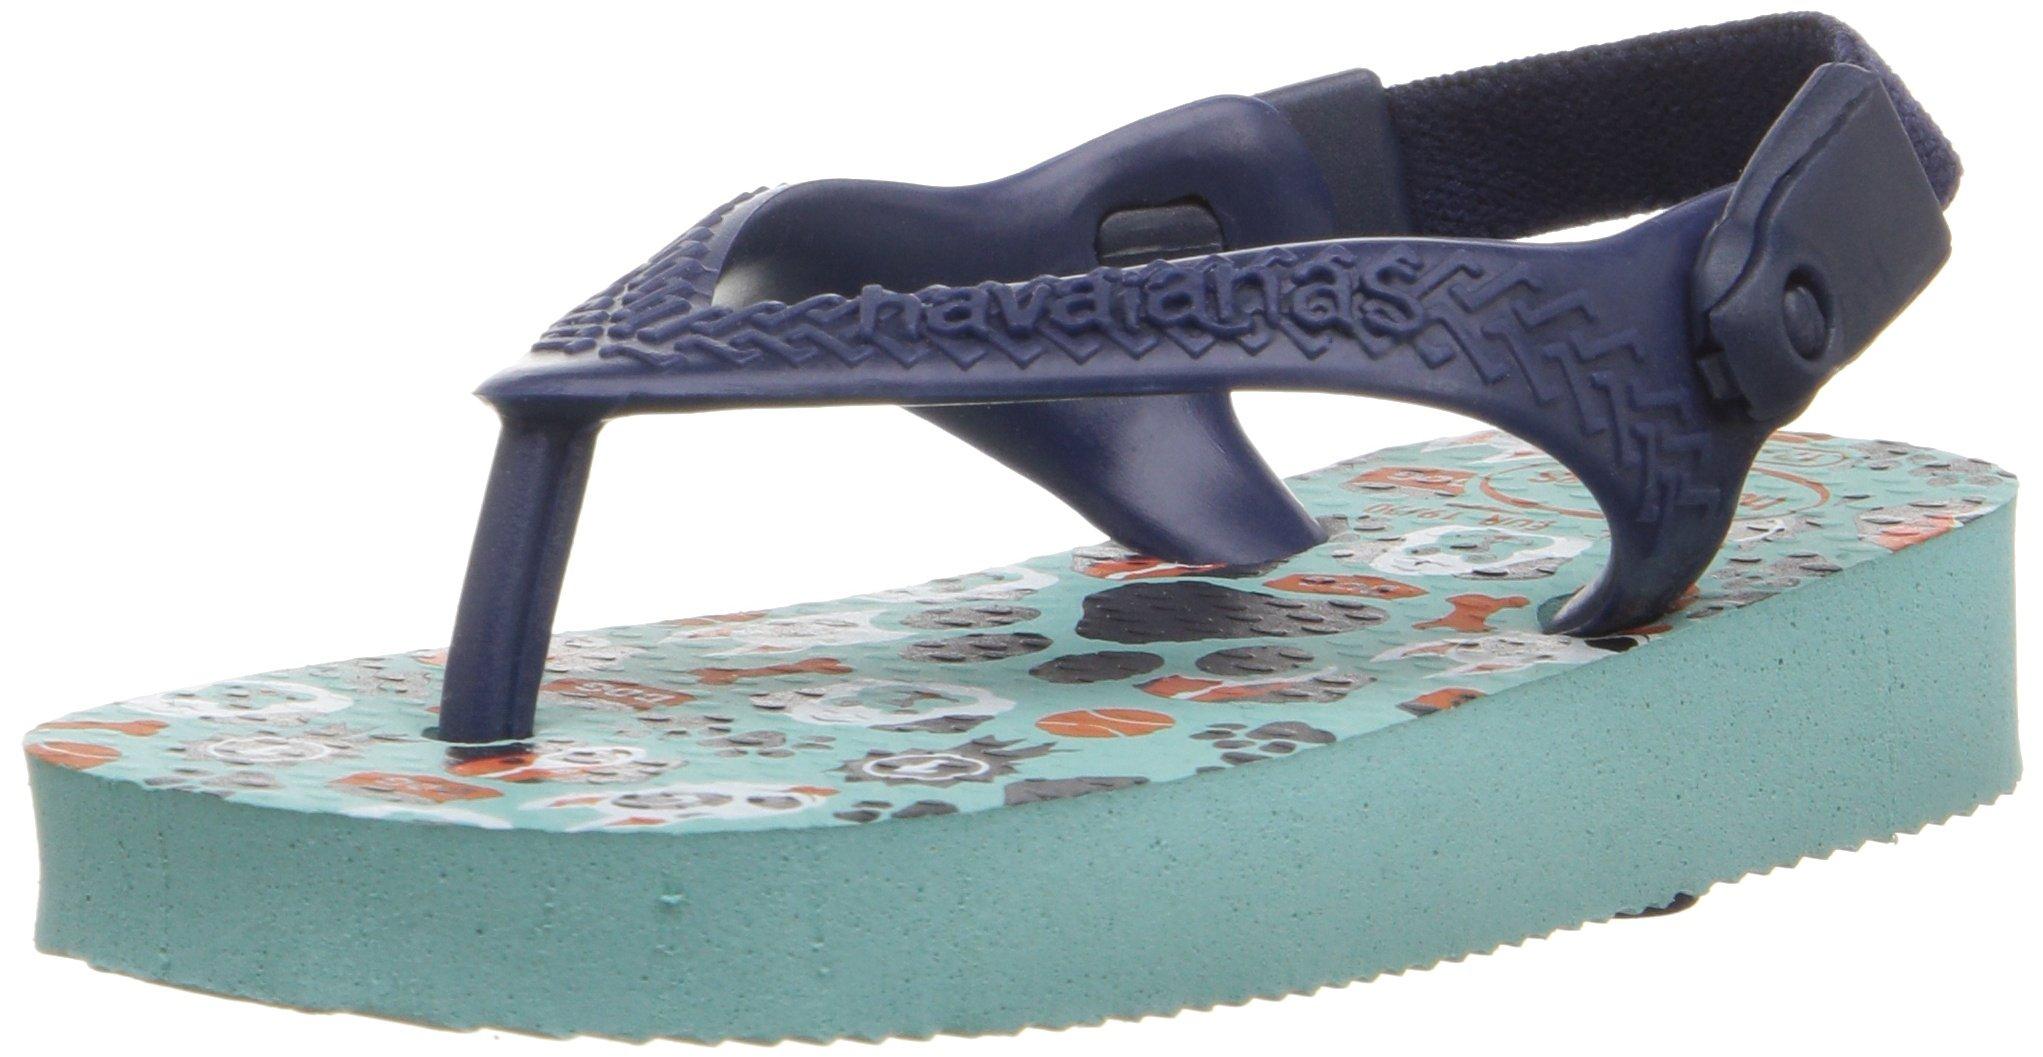 Havaianas Kids Flip Flop Sandals, Baby Pets, Ice Blue/Navy Blue,Ice Blue/Navy Blue,19 BR (5 M US Toddler)